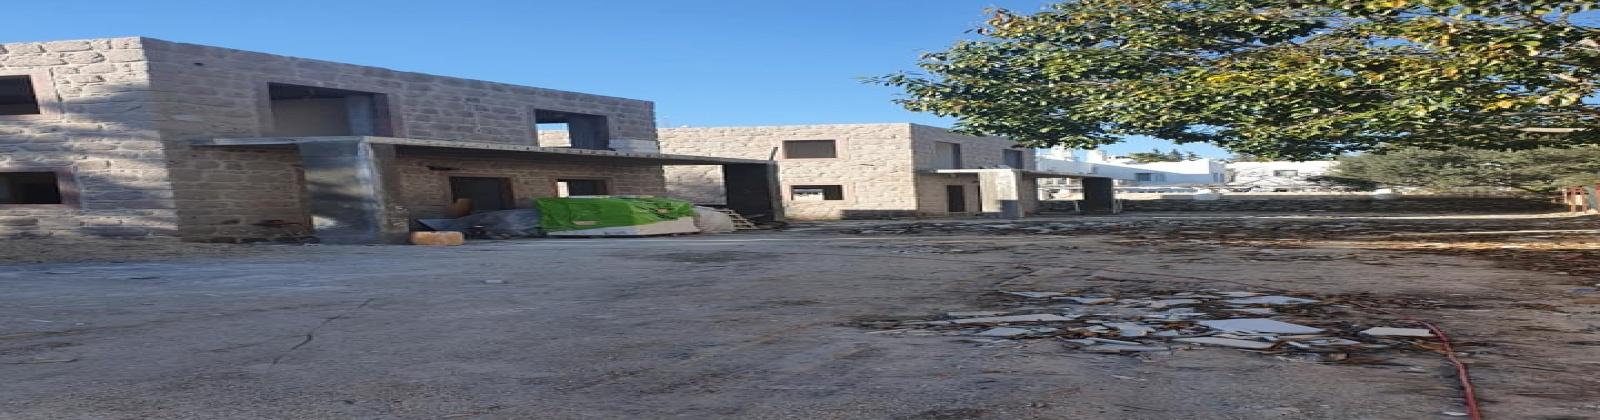 1 Bodrum 2, Muğla, 48400, 3 Bedrooms Bedrooms, ,2 BathroomsBathrooms,Villa,For sale,Marina Villa,Bodrum,1002